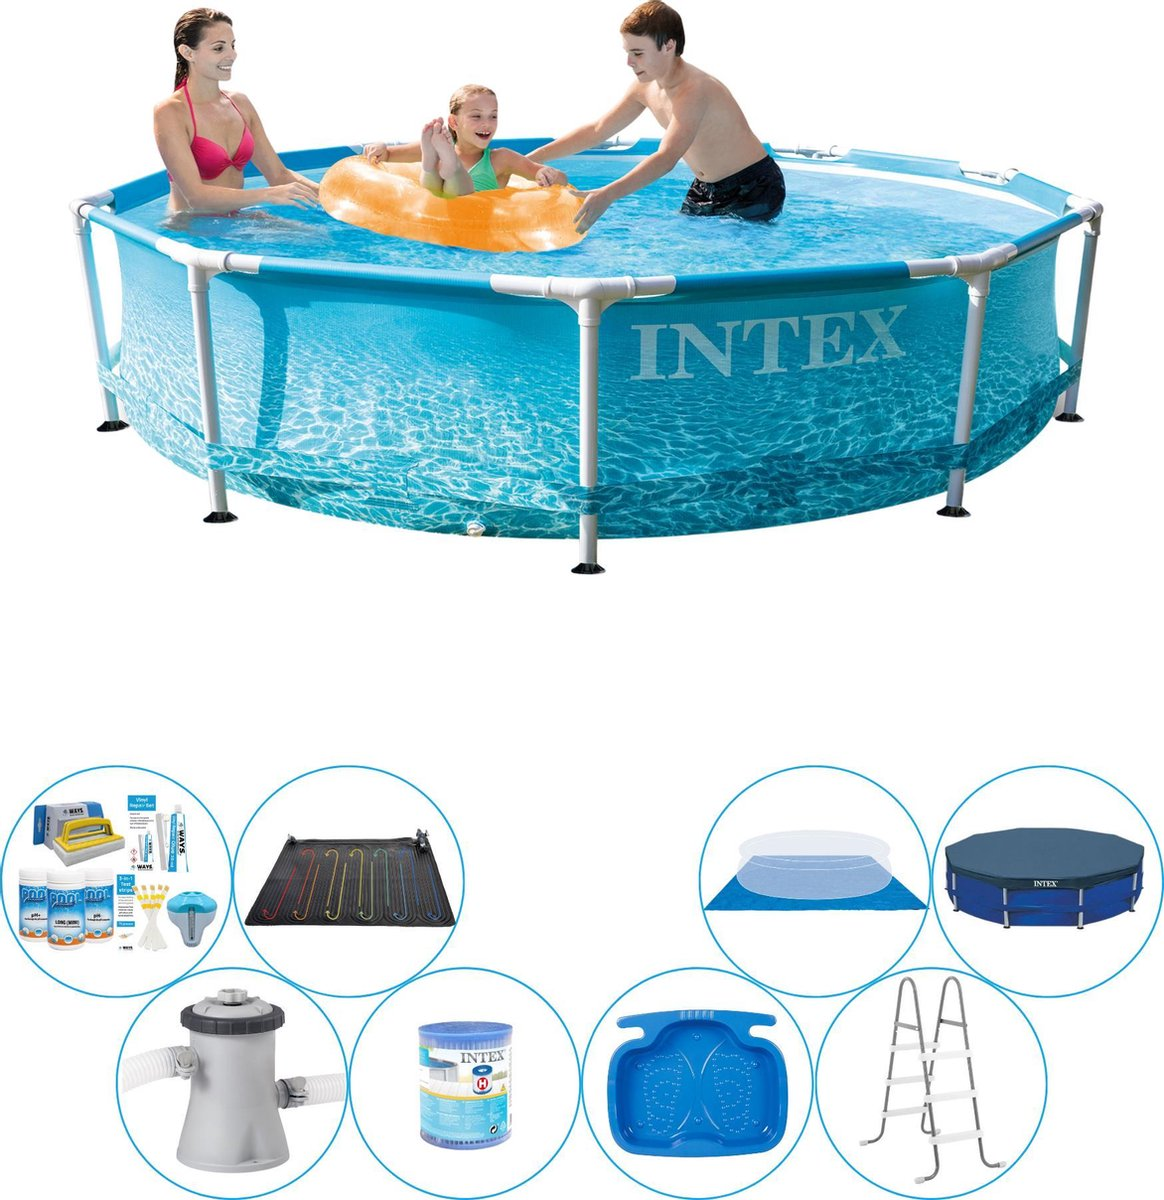 Zwembad Super Deal - Intex Metal Frame Rond Strandzijde 305x76 cm